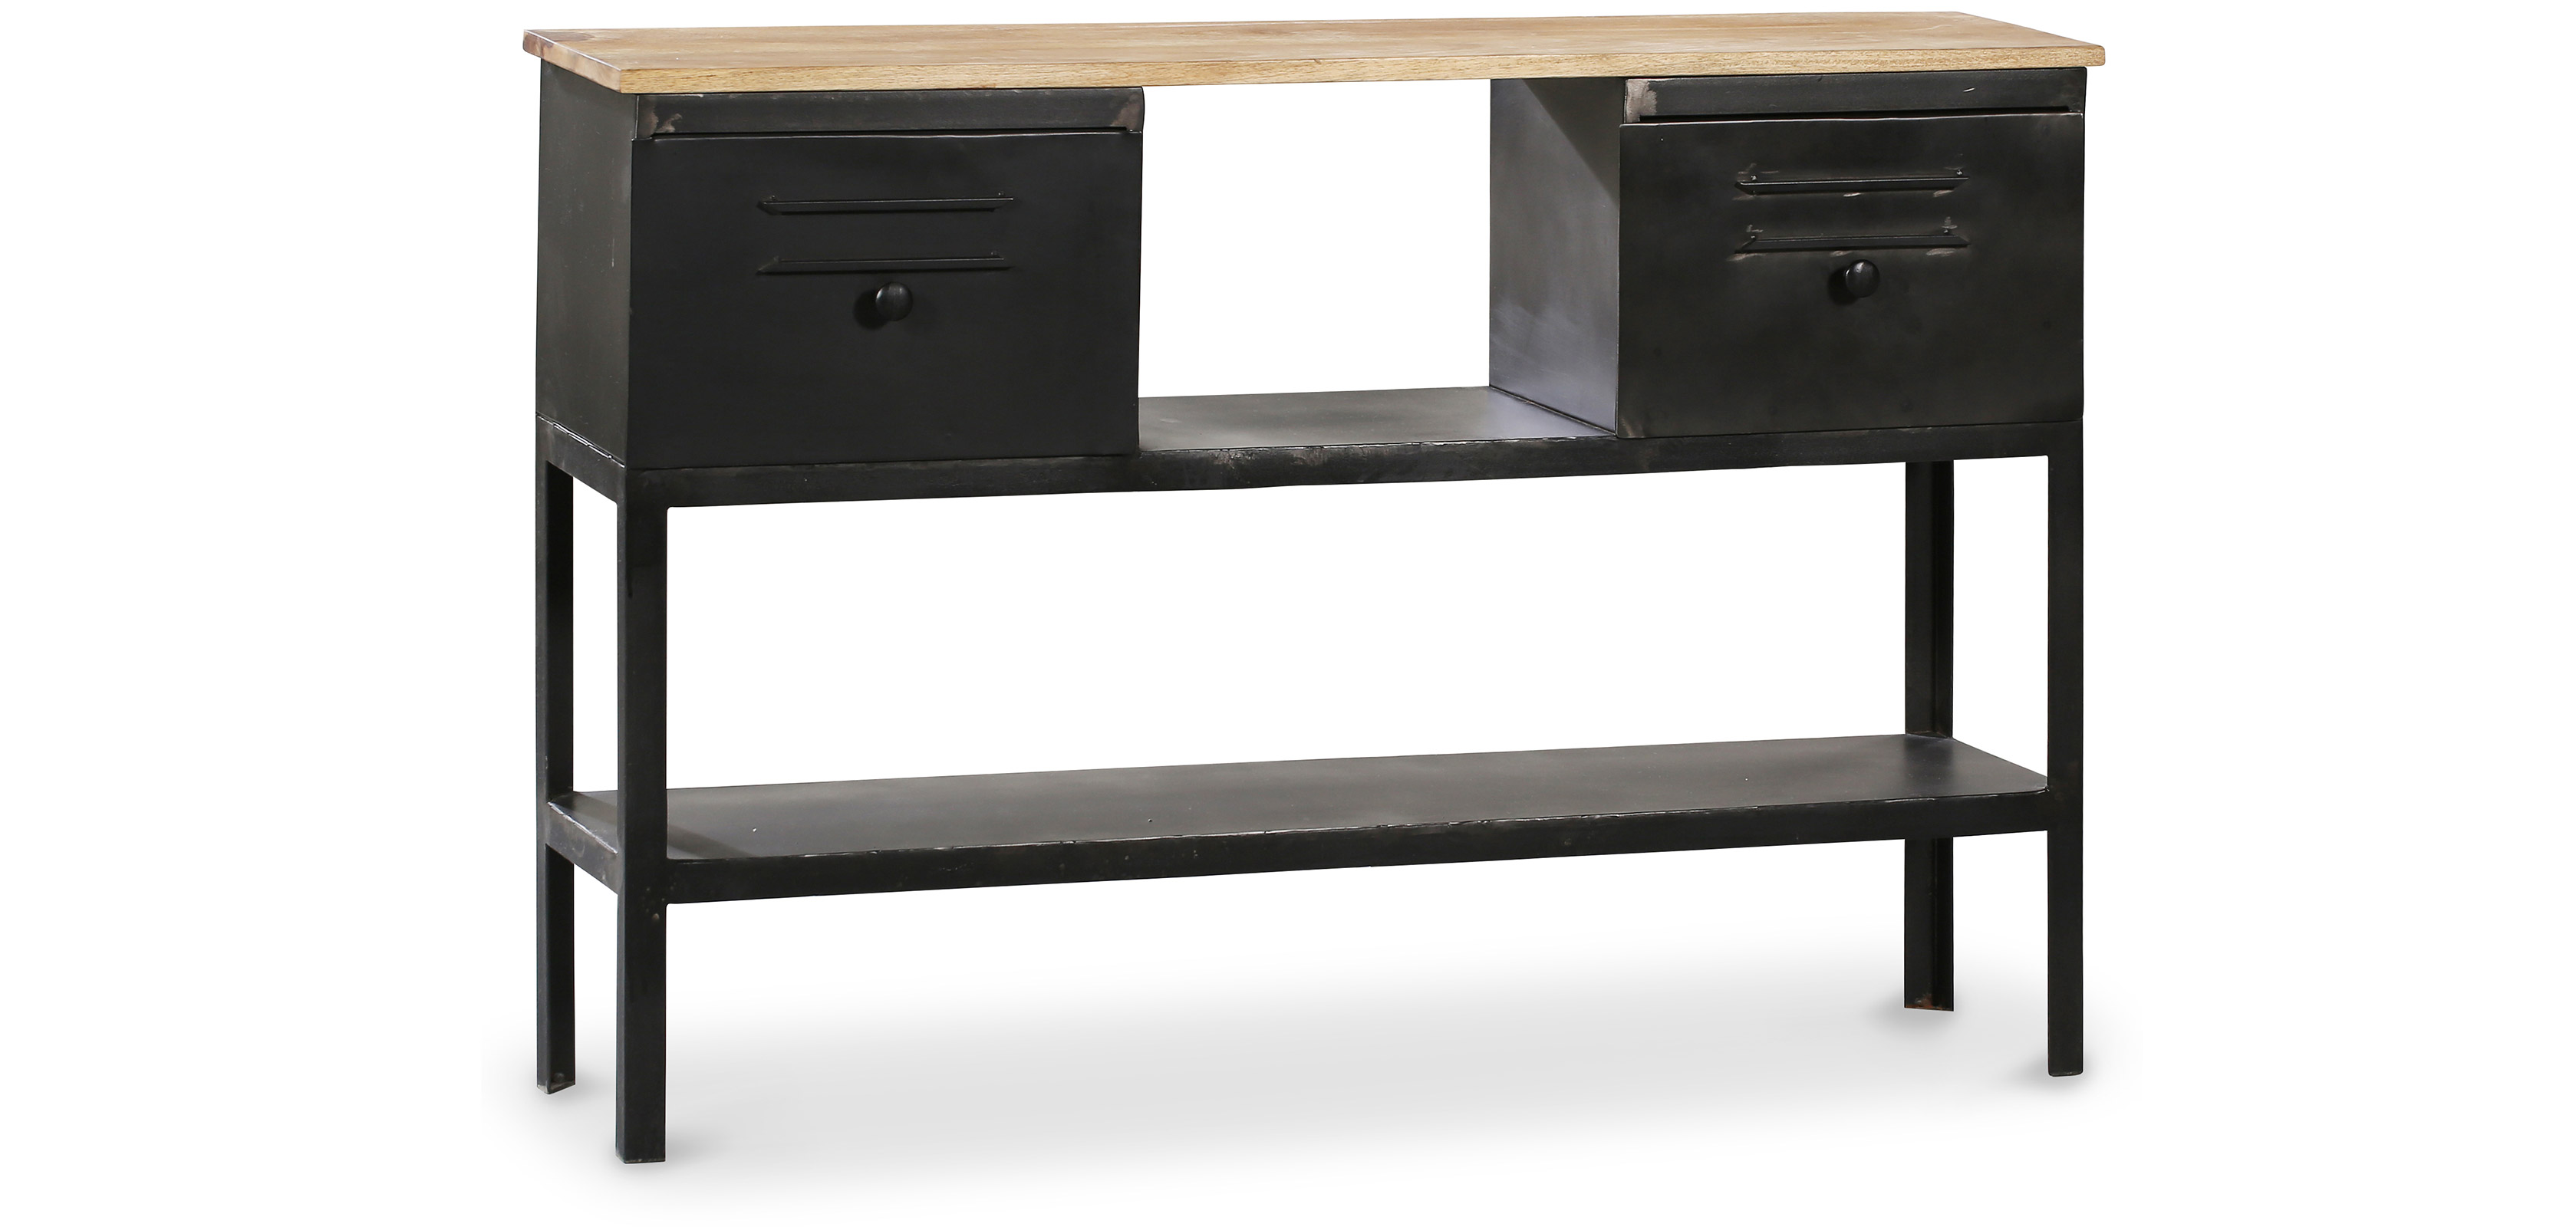 industrial konsolentisch 2 schubladen metall. Black Bedroom Furniture Sets. Home Design Ideas